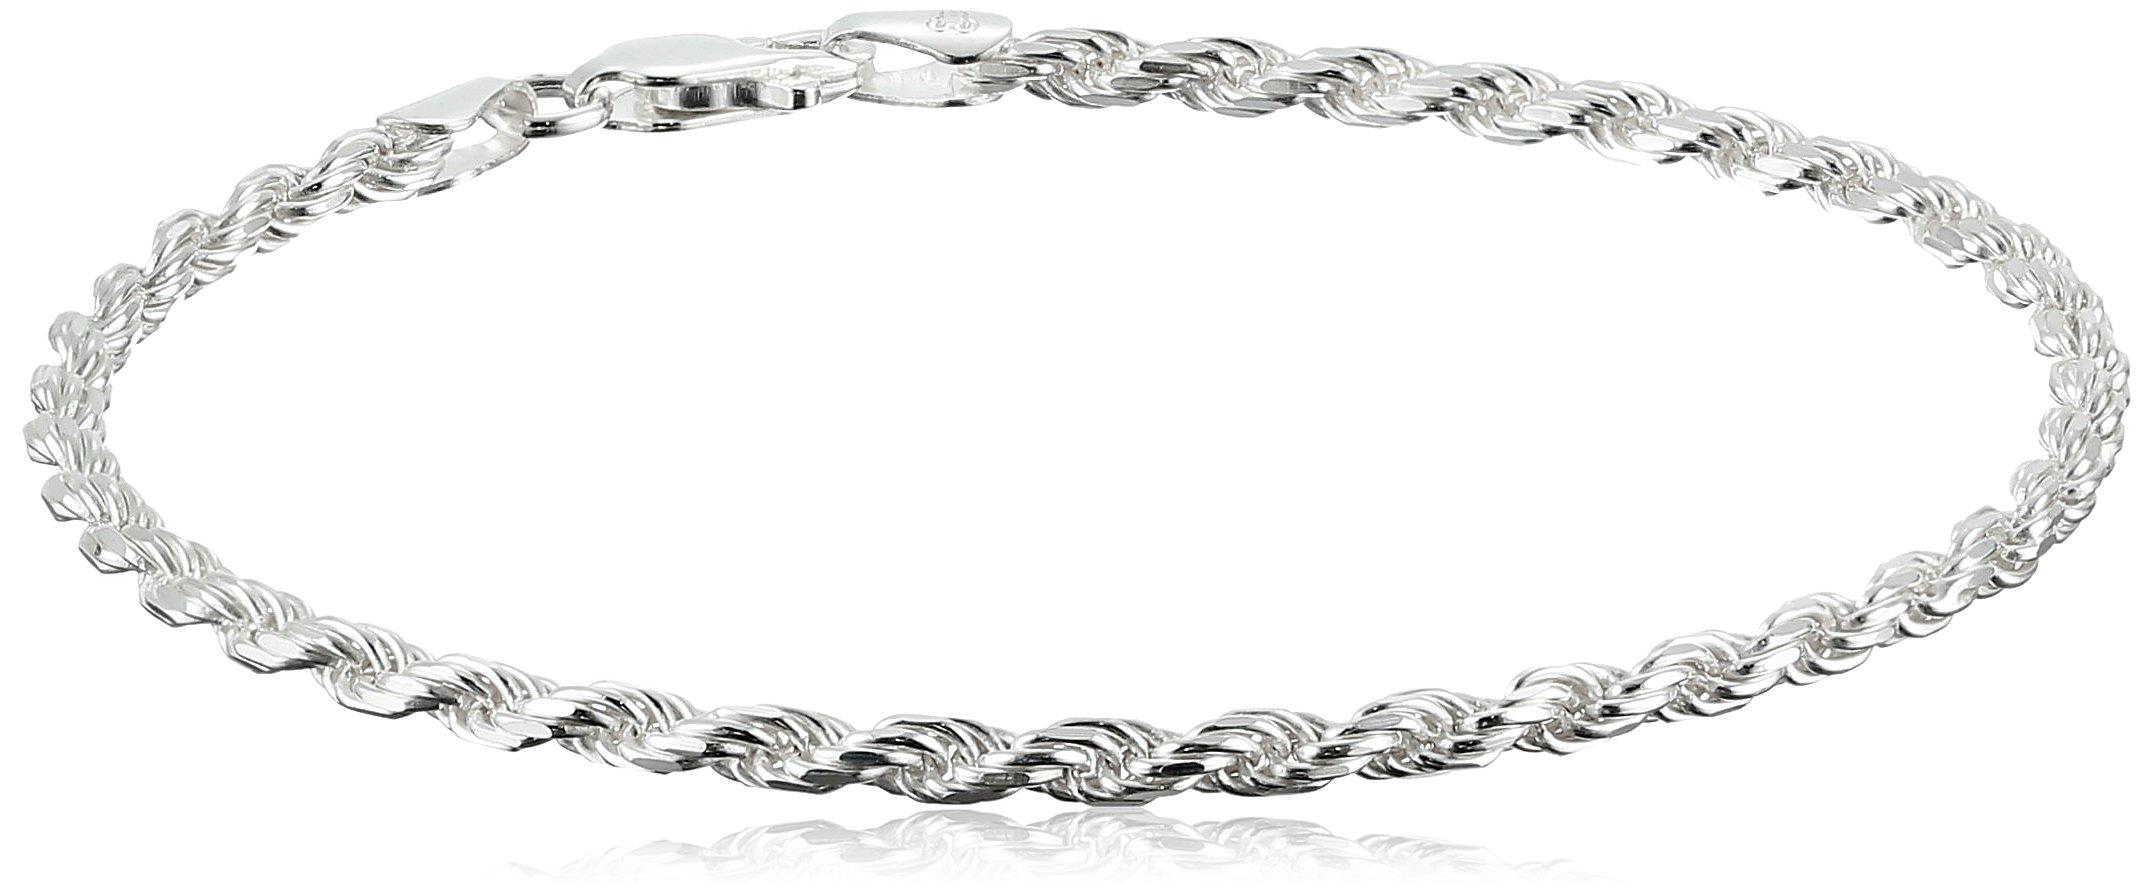 Amazon Essentials Sterling Silver Diamond-Cut Rope Chain Link Bracelet, 8''